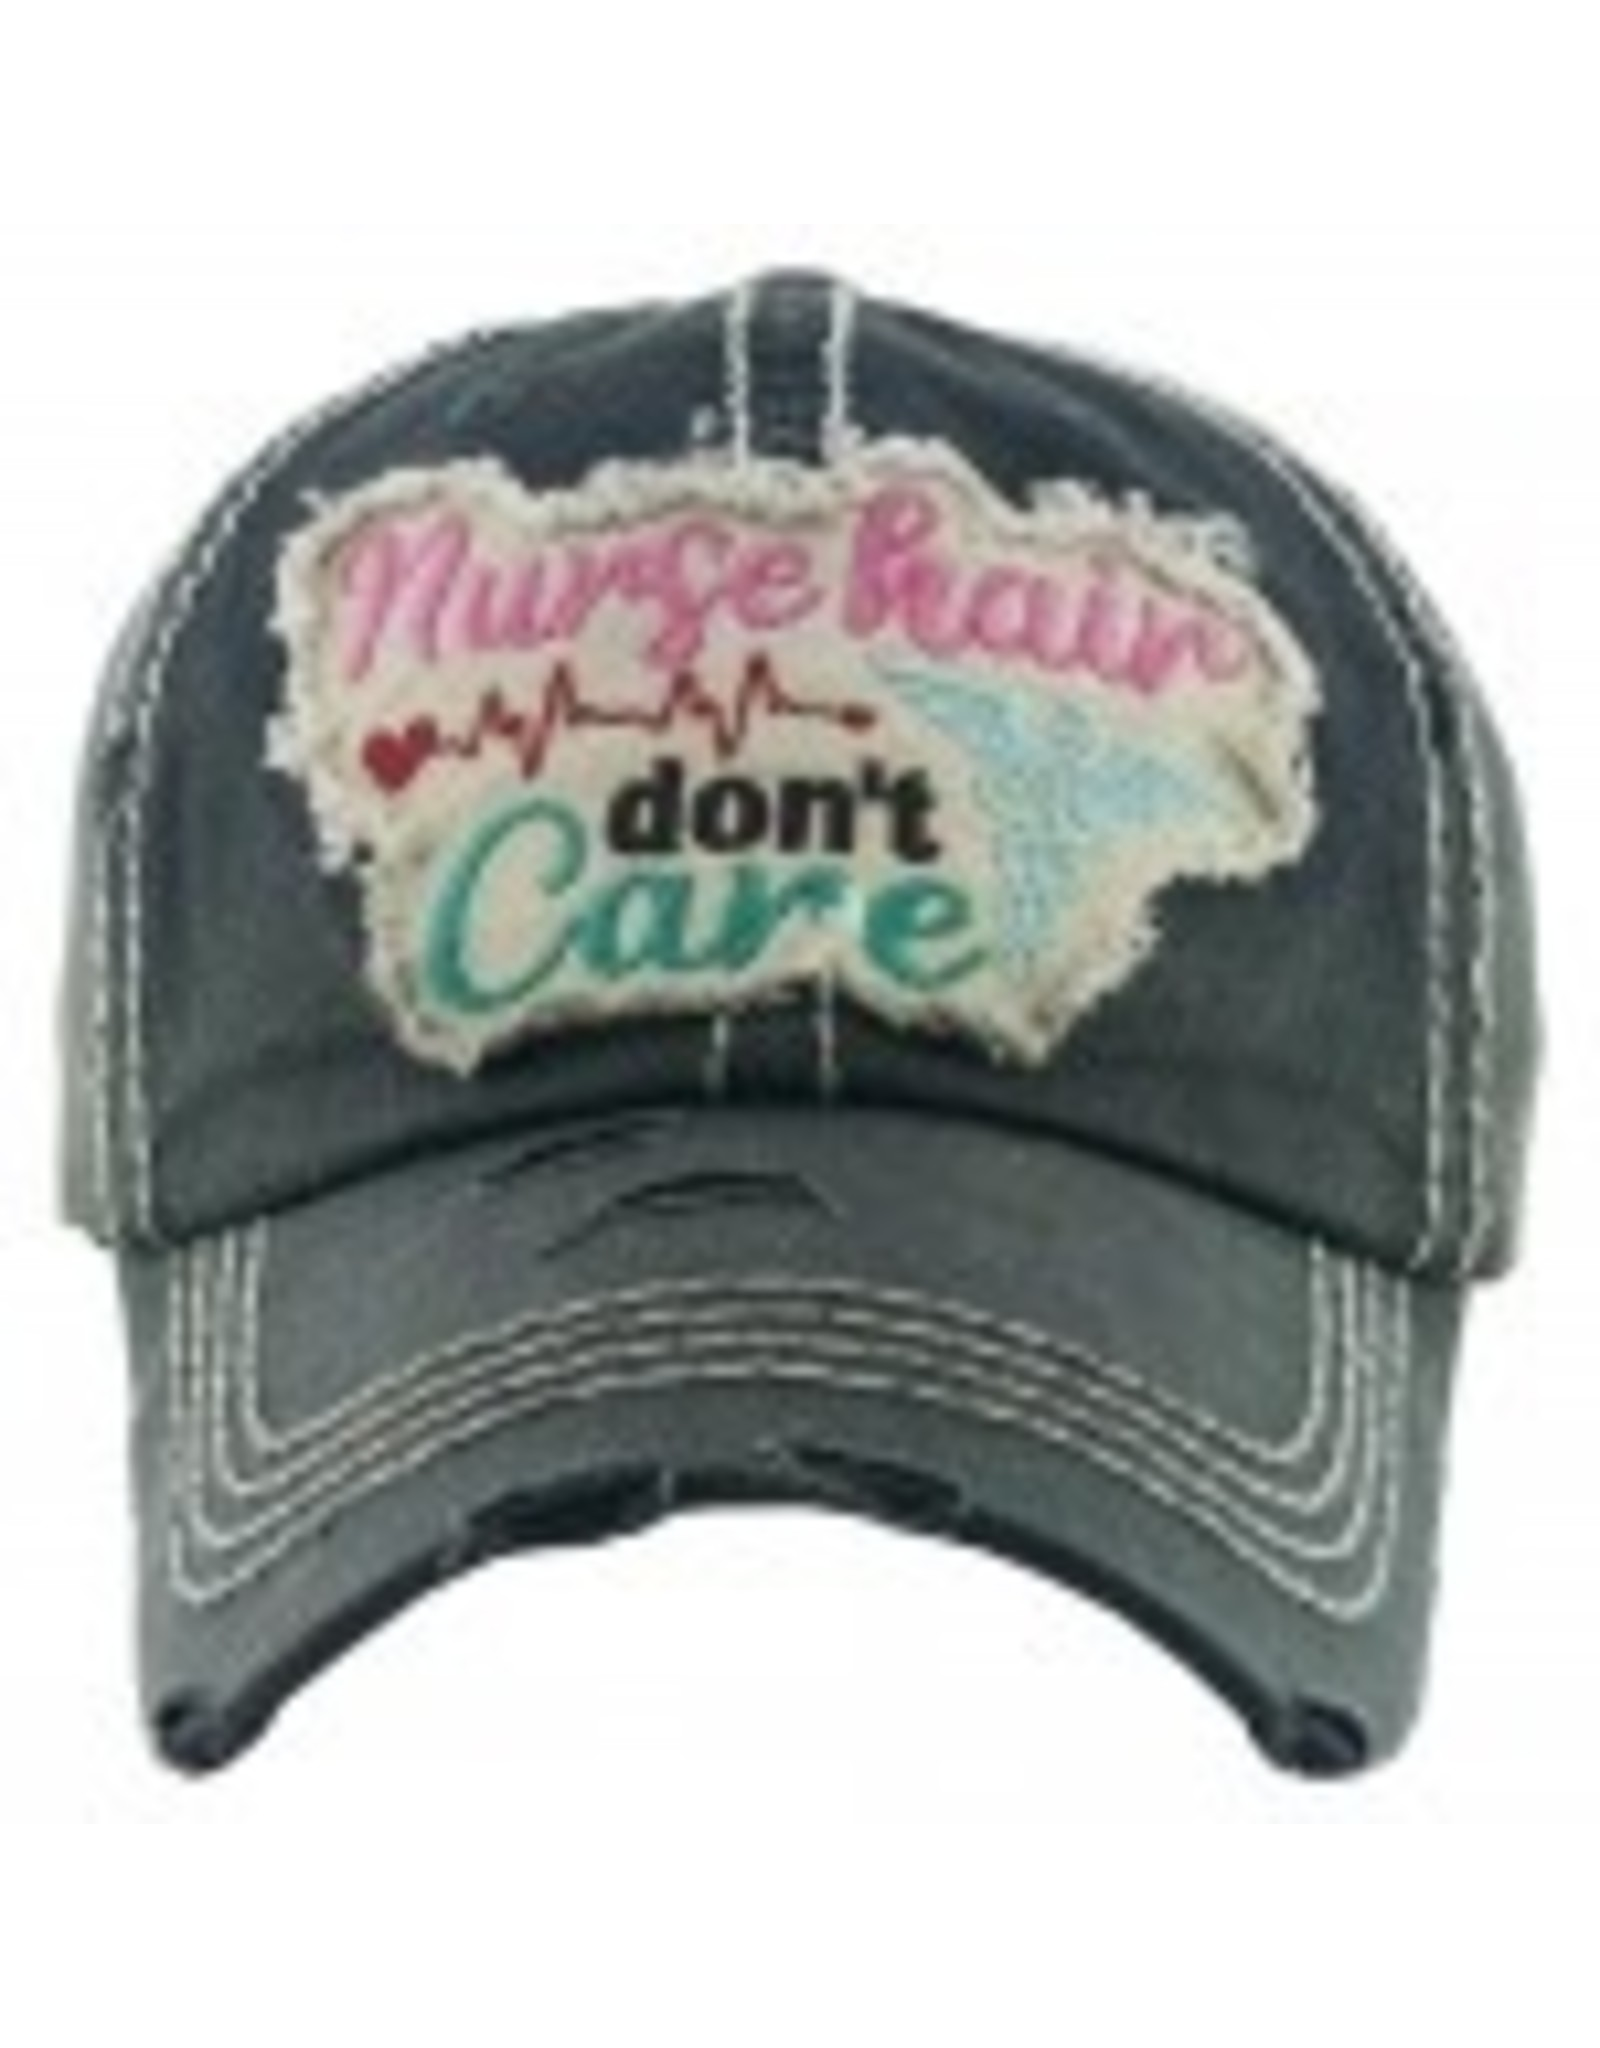 Nurse Hair Don't Care Hat Gray